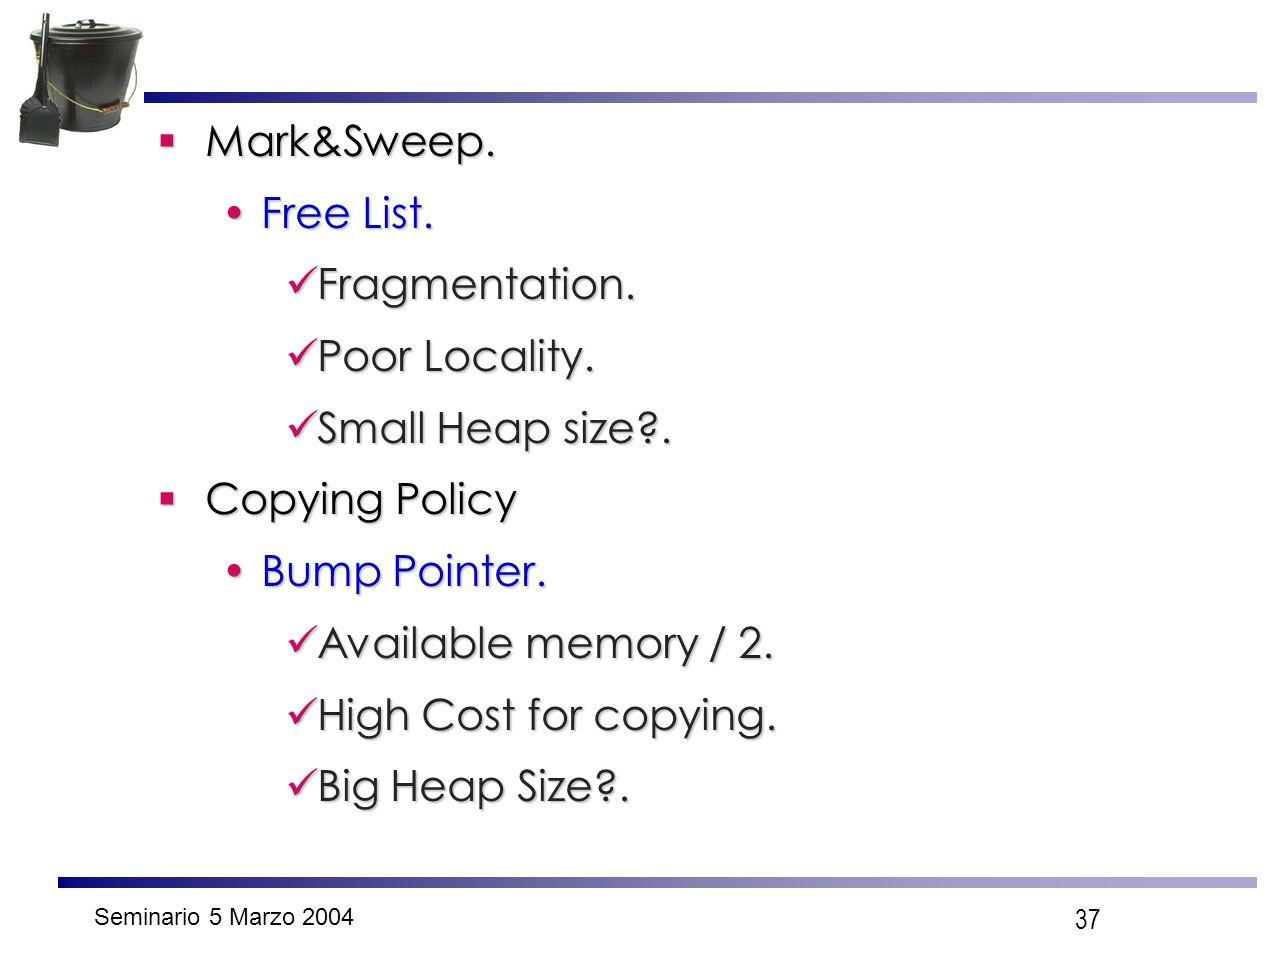 Seminario 5 Marzo 2004 37  Mark&Sweep. Free List.Free List.